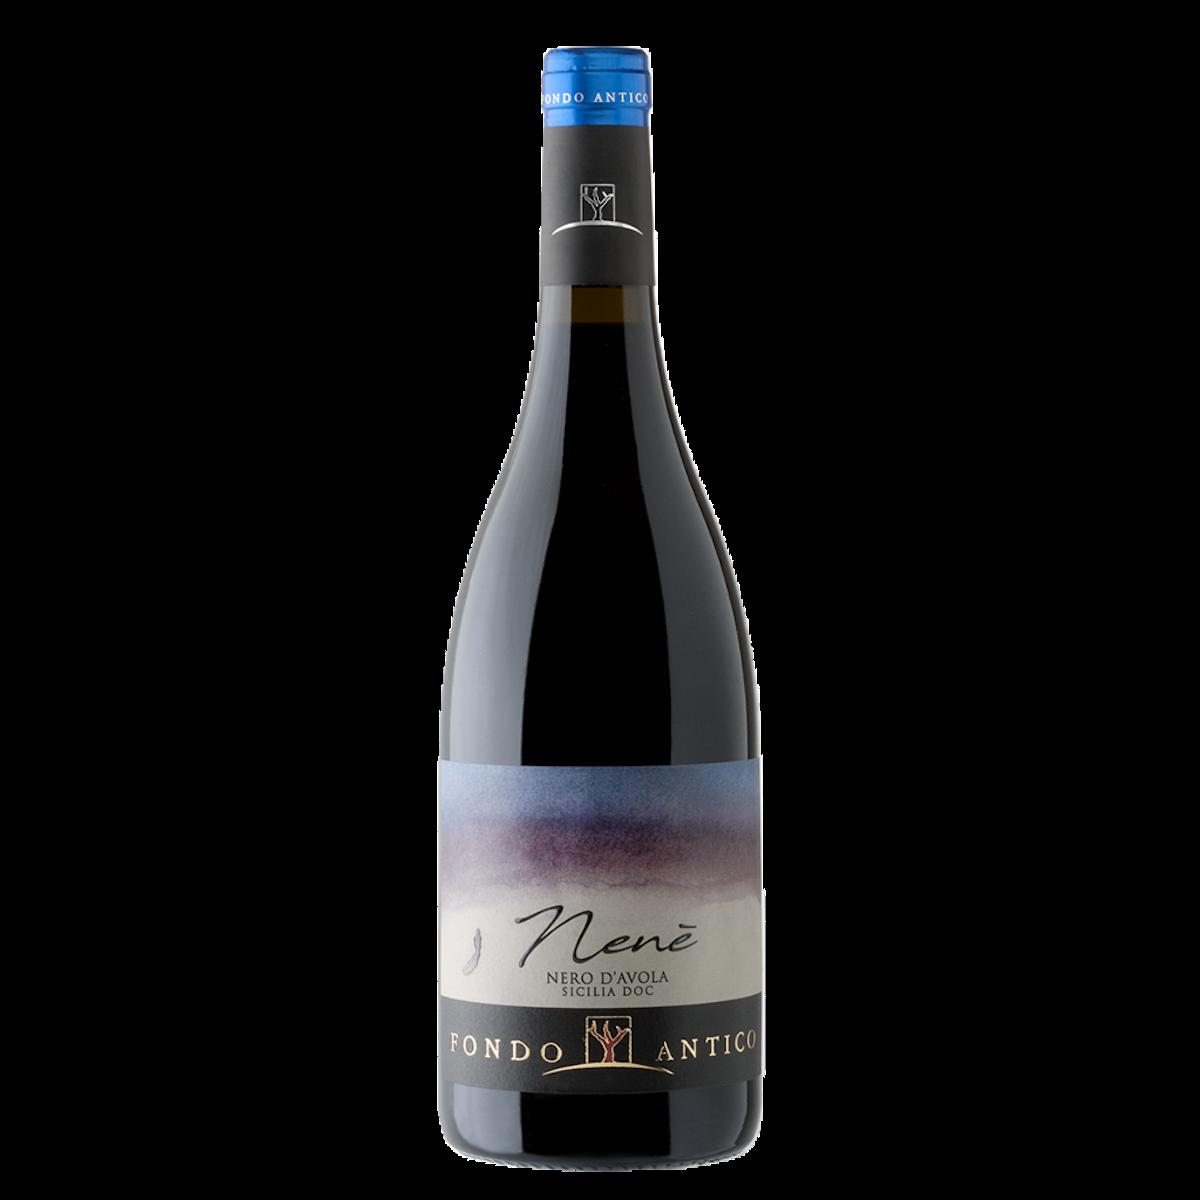 Nero d'Avola 'Nenè', 2019